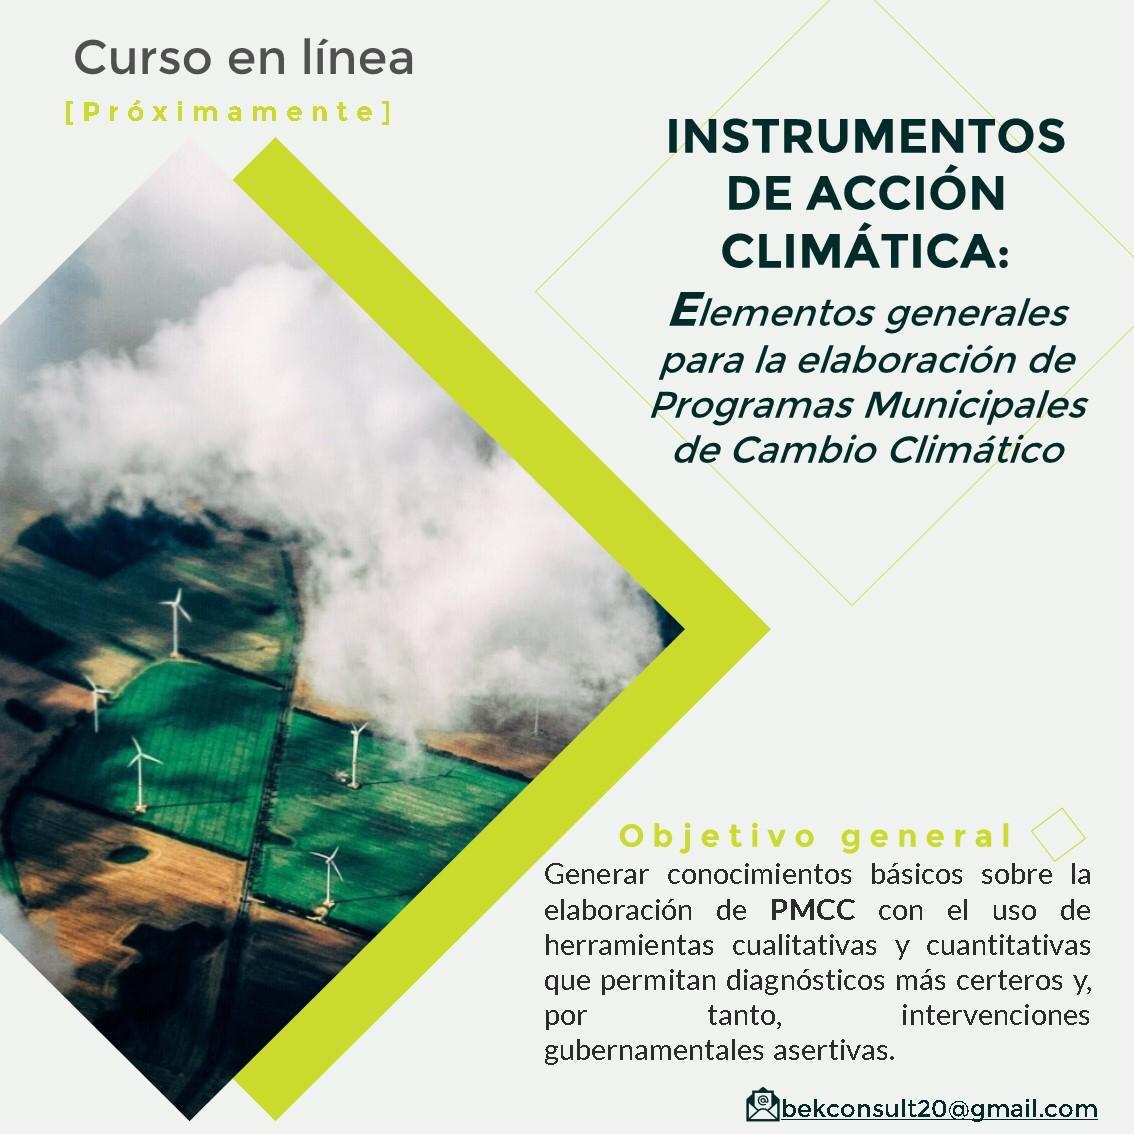 RT @capistrata: Próximamente #BekConsultoria #CambioClimático #Guadalajara #Jalisco #BuenosDias #FelizMiercoles https://t.co/nAD3OphaTY